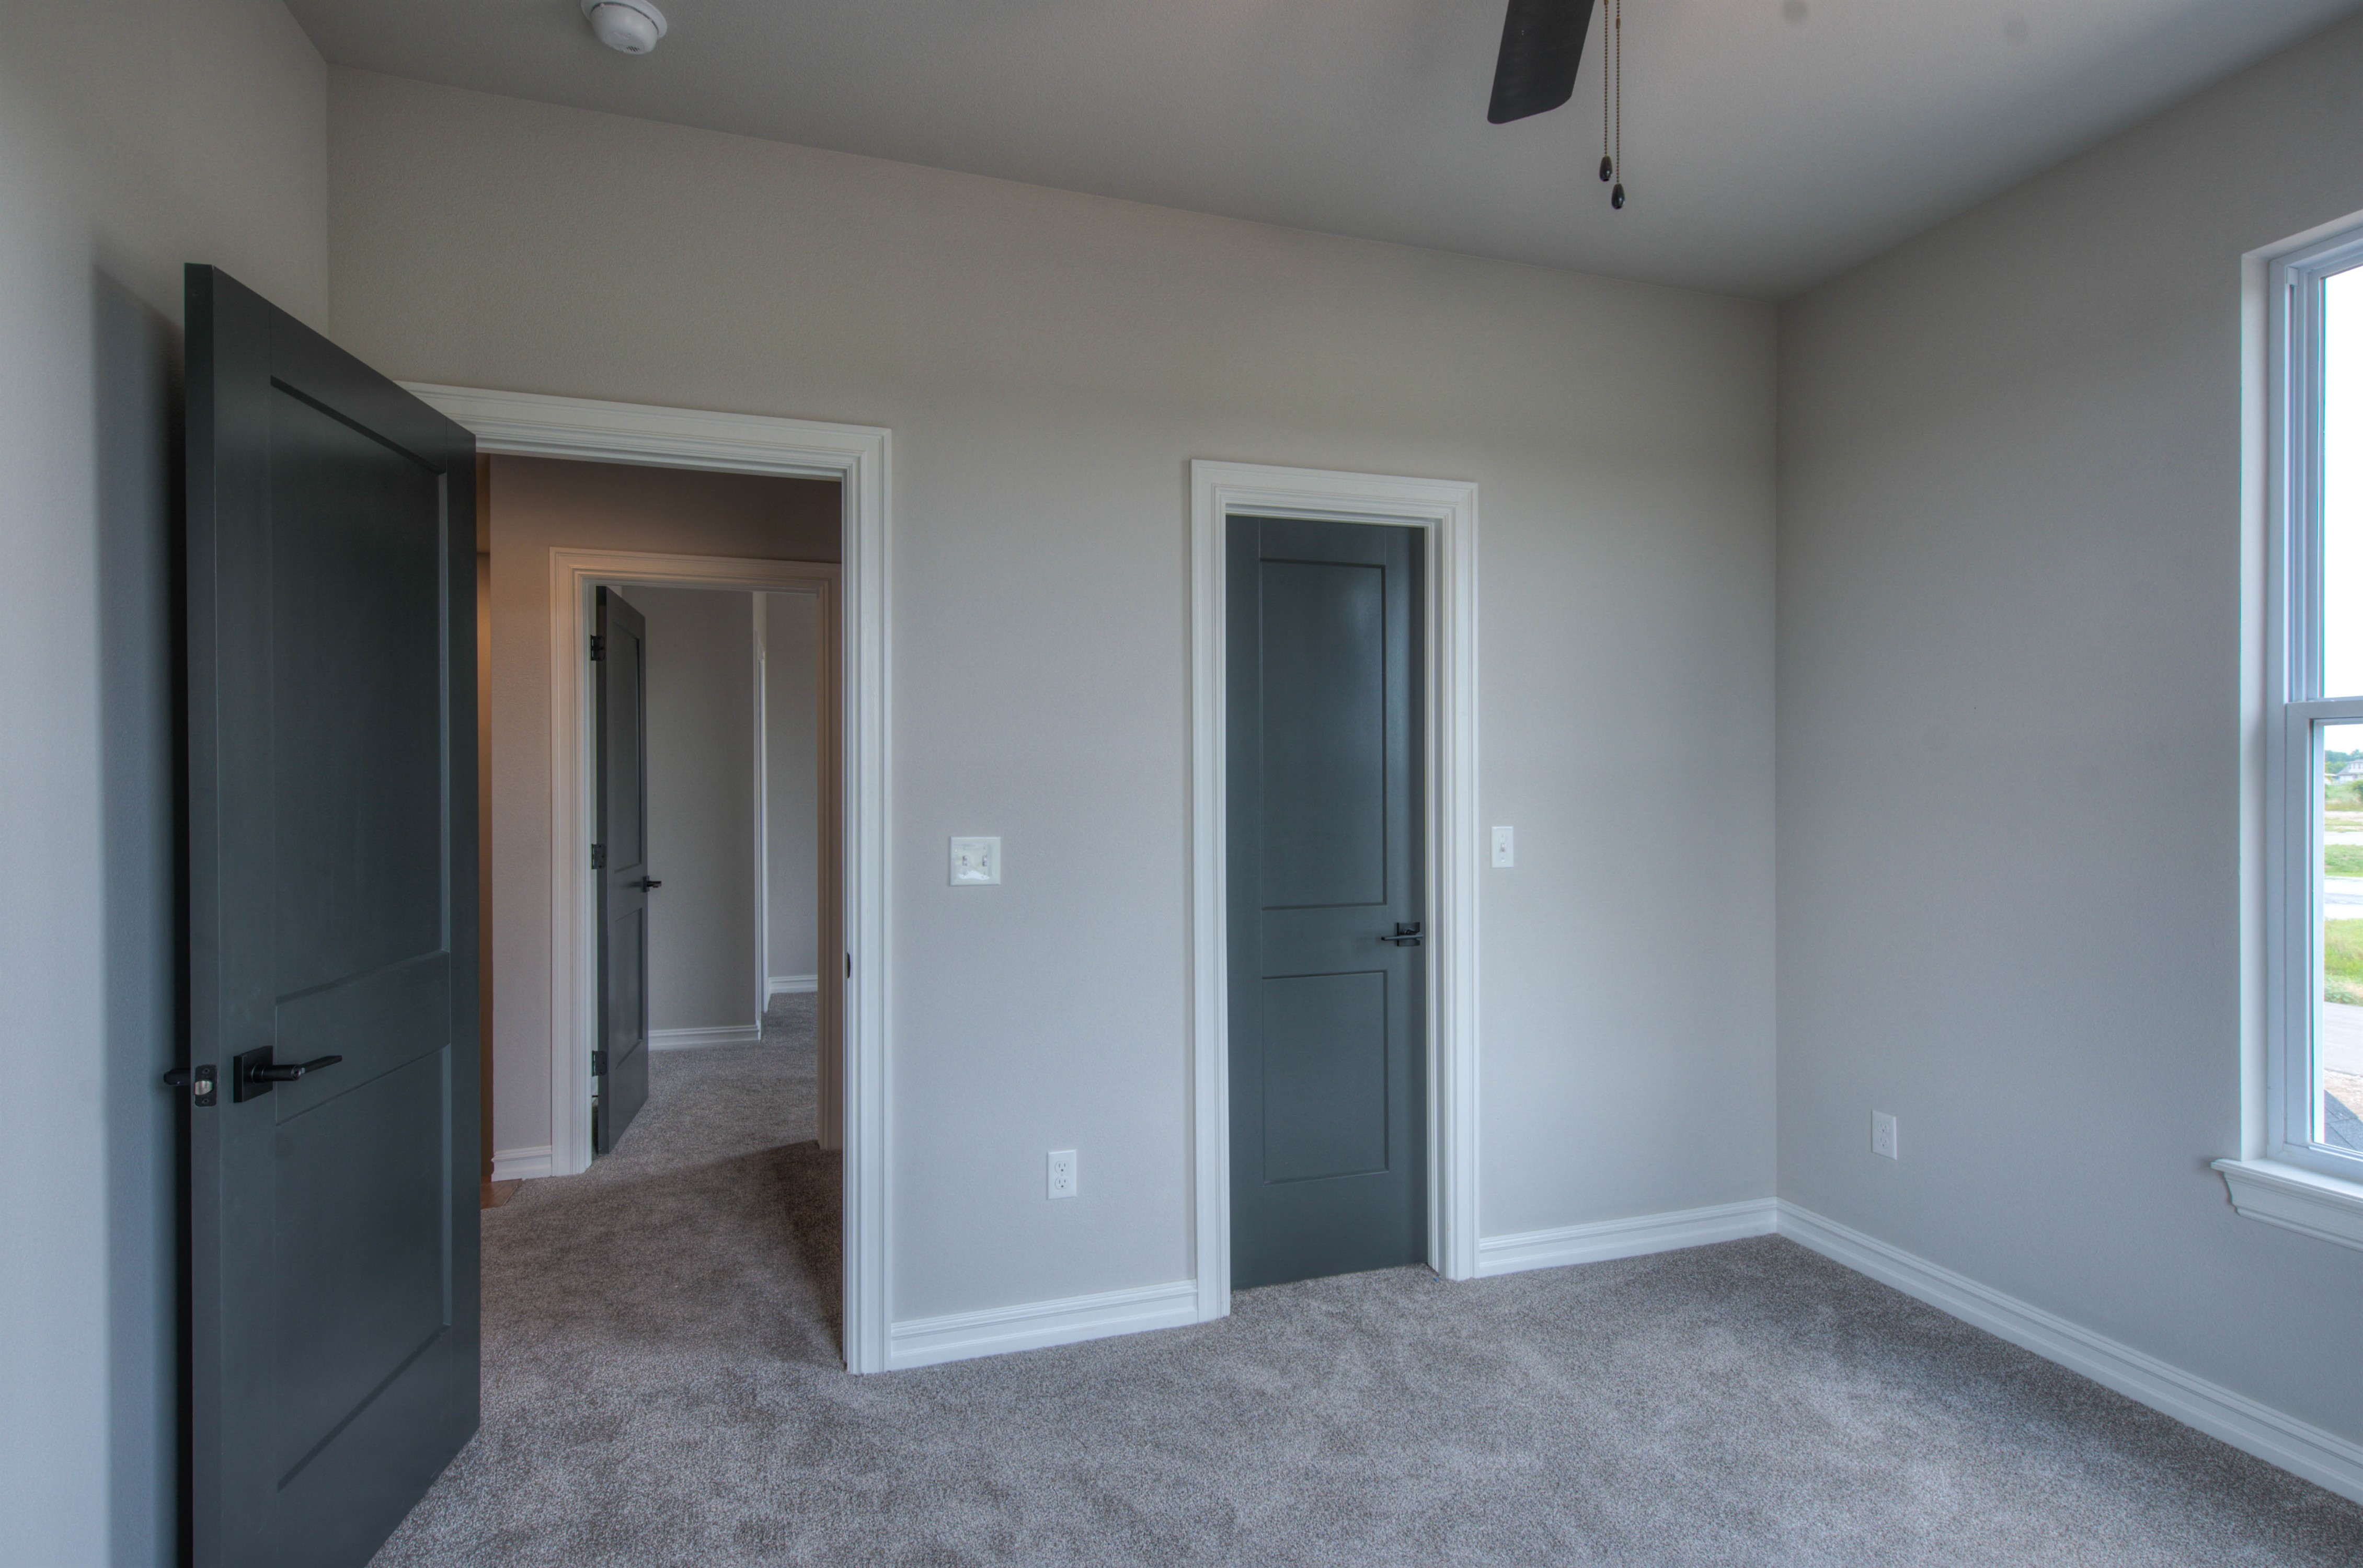 15850 E 107th Street North Property Photo 33